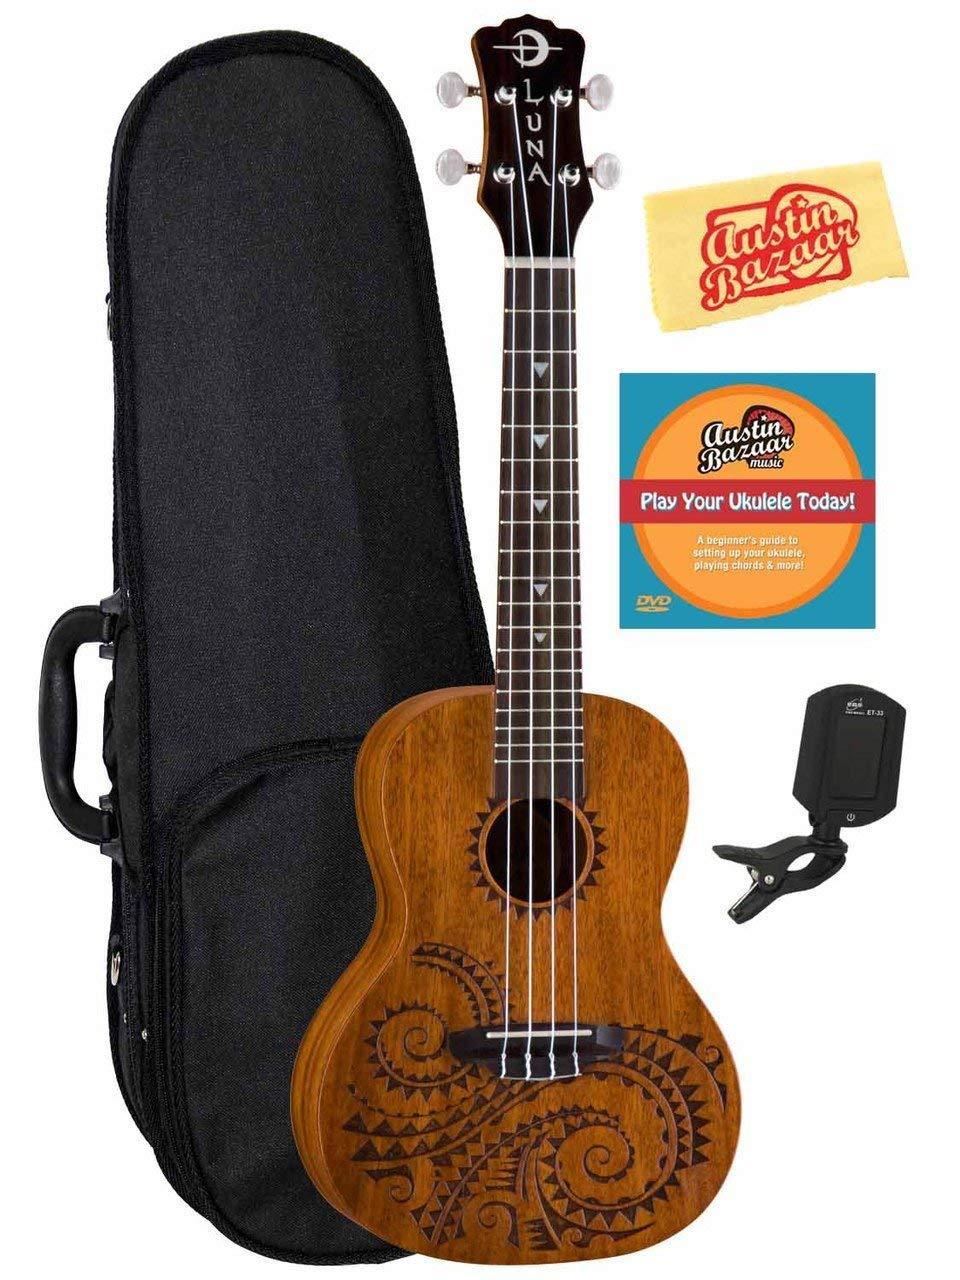 Luna Tattoo Mahogany Concert Ukulele Bundle with Hard Case, Tuner, Austin Bazaar Instructional DVD, and Polishing Cloth by Luna Guitars (Image #1)